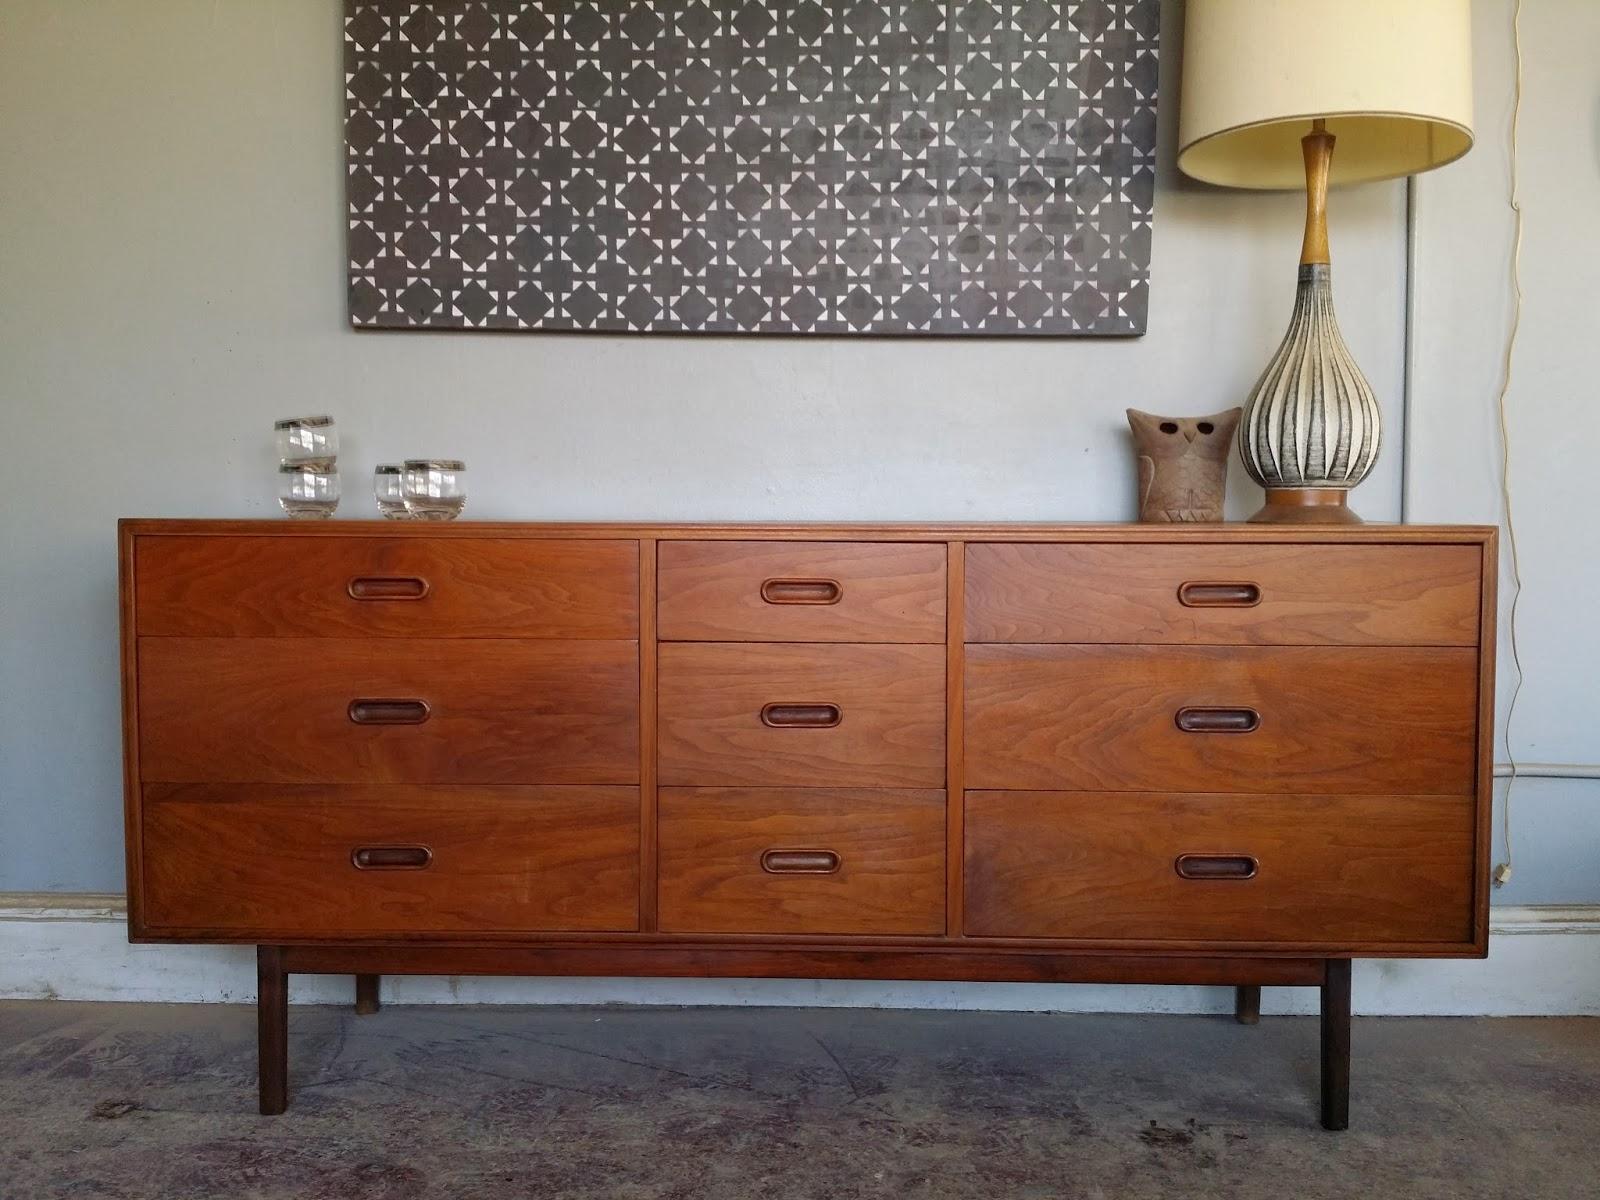 vintage ground mid century danish modern nine drawer buffet dresser media console. Black Bedroom Furniture Sets. Home Design Ideas